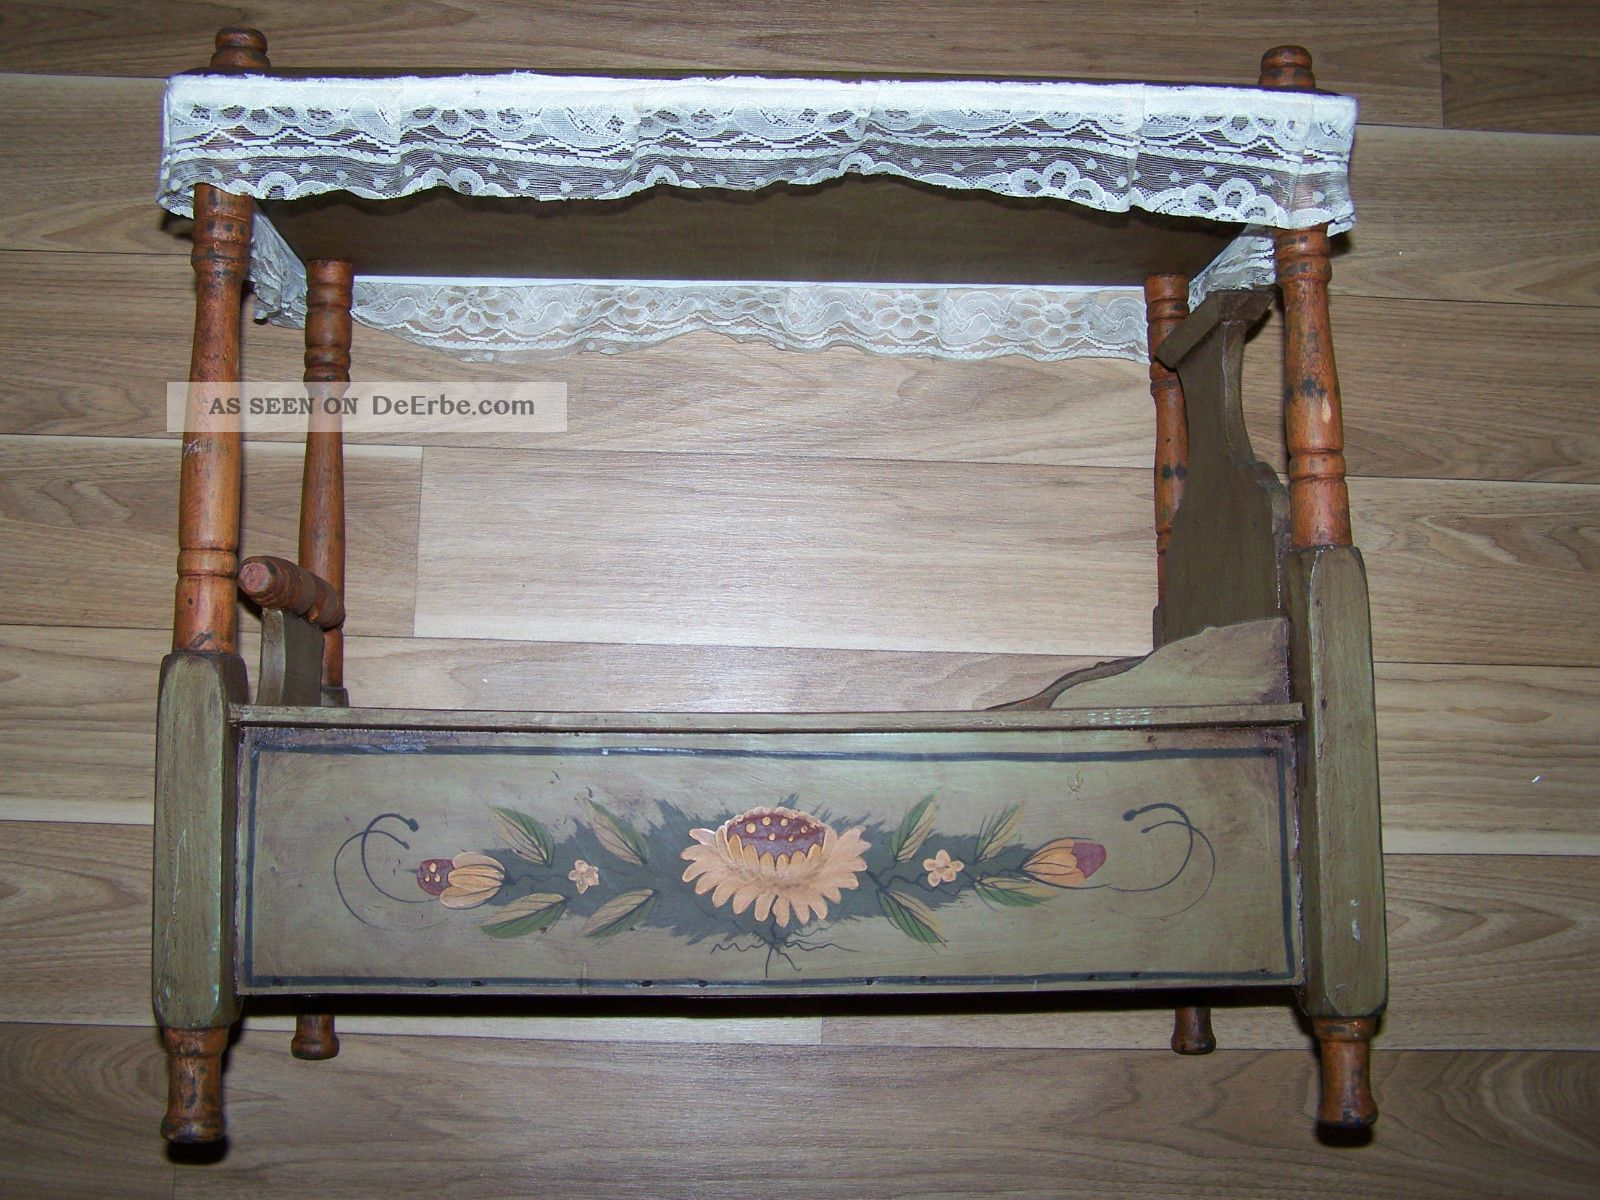 Puppenbett Etagenbett Holz : Altes puppenbett hochbett aus holz mit bauermalerei